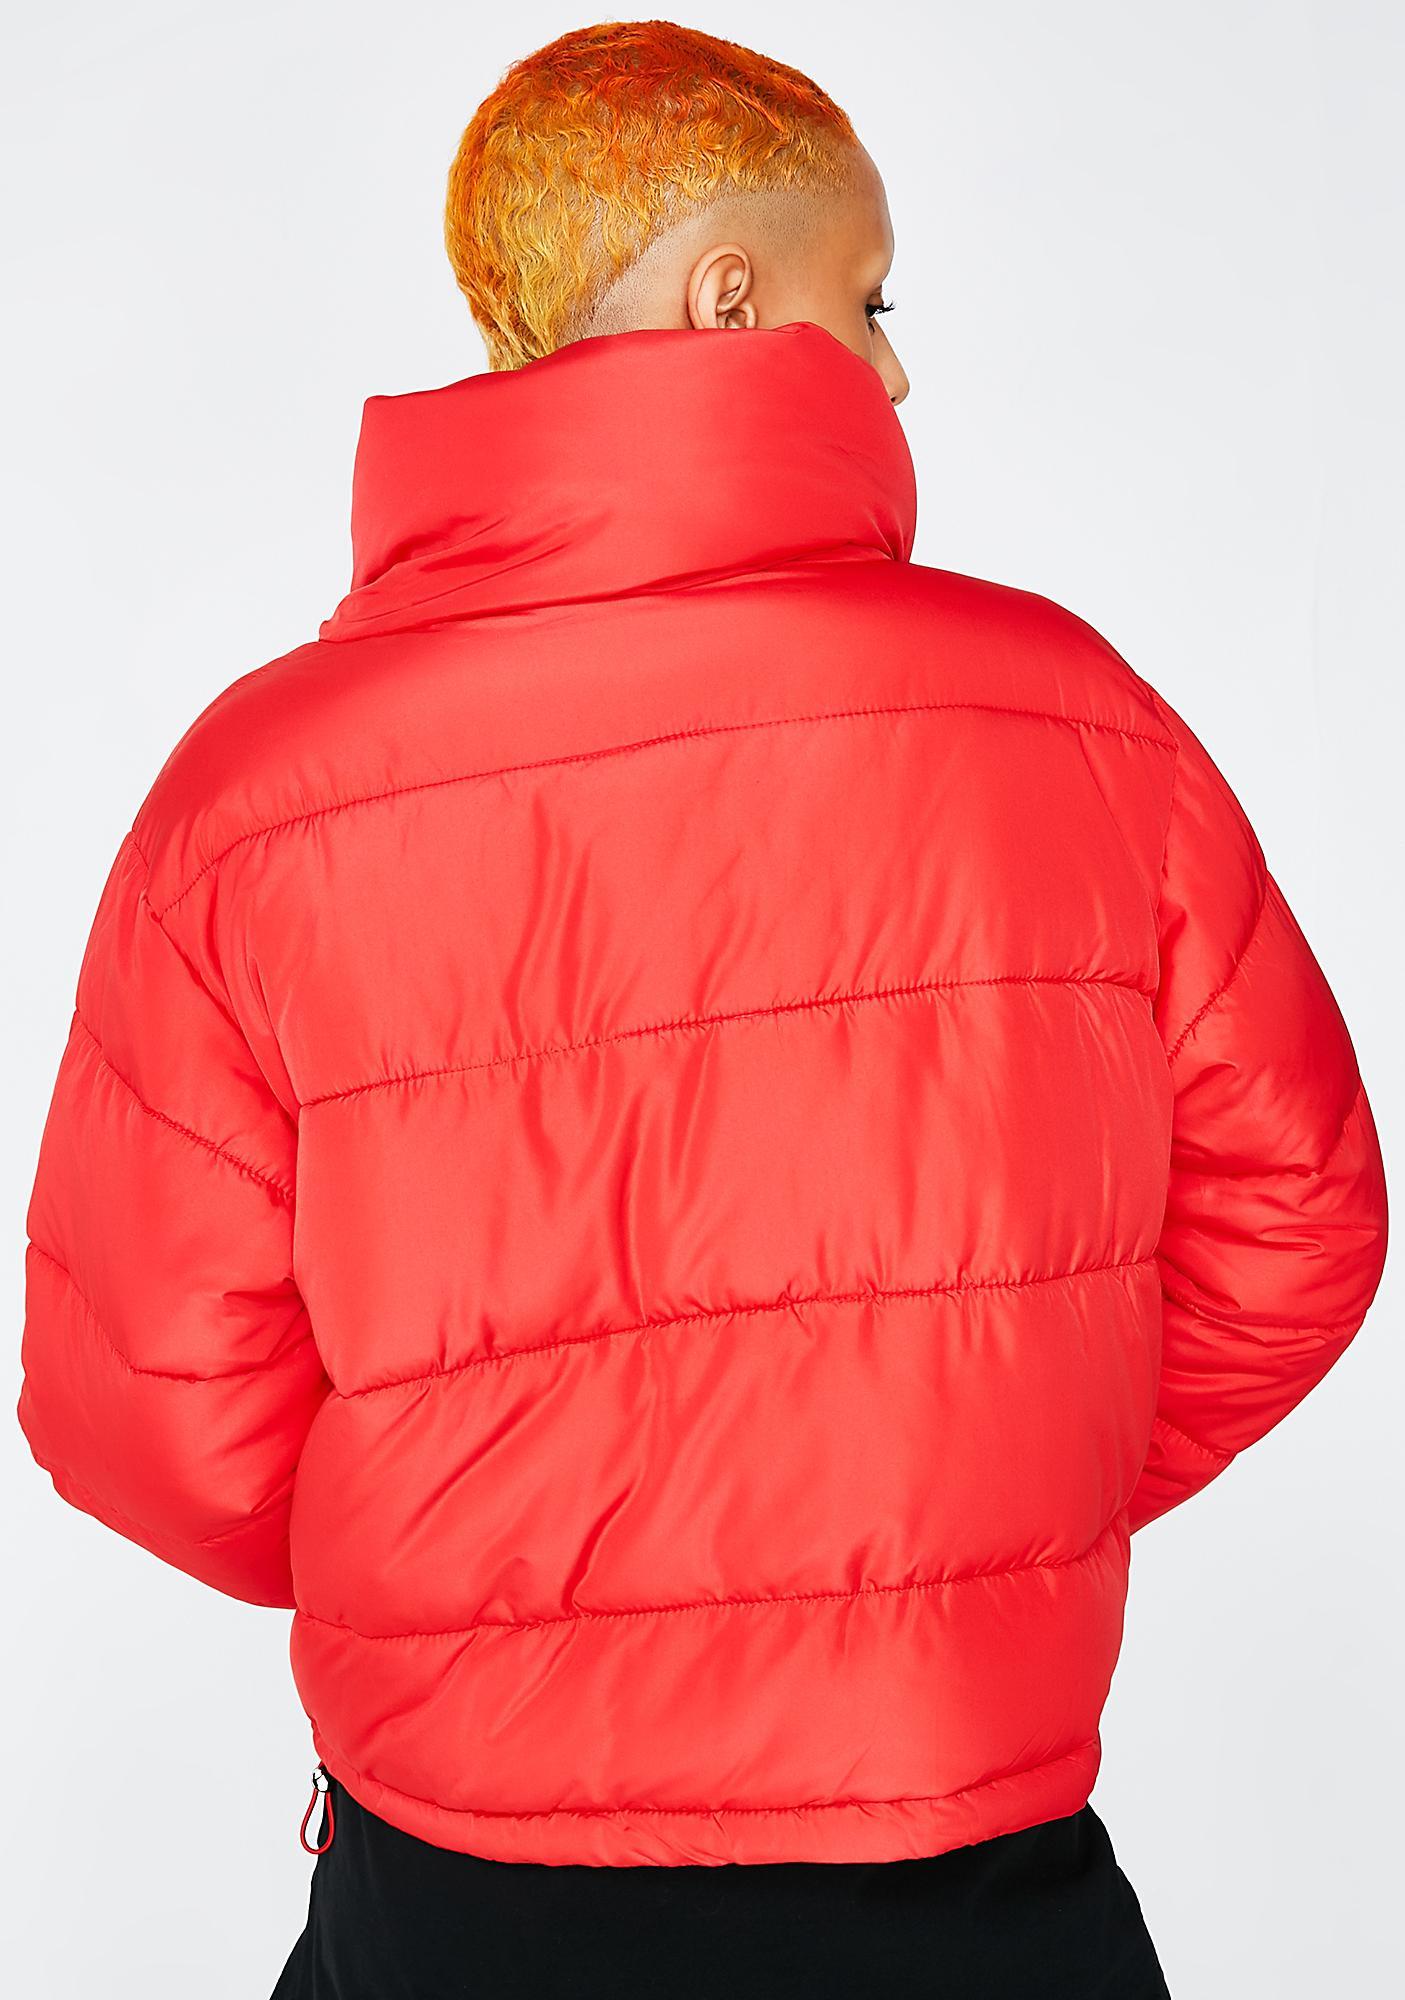 Glamorous Flame Hood Dreams Puff Jacket